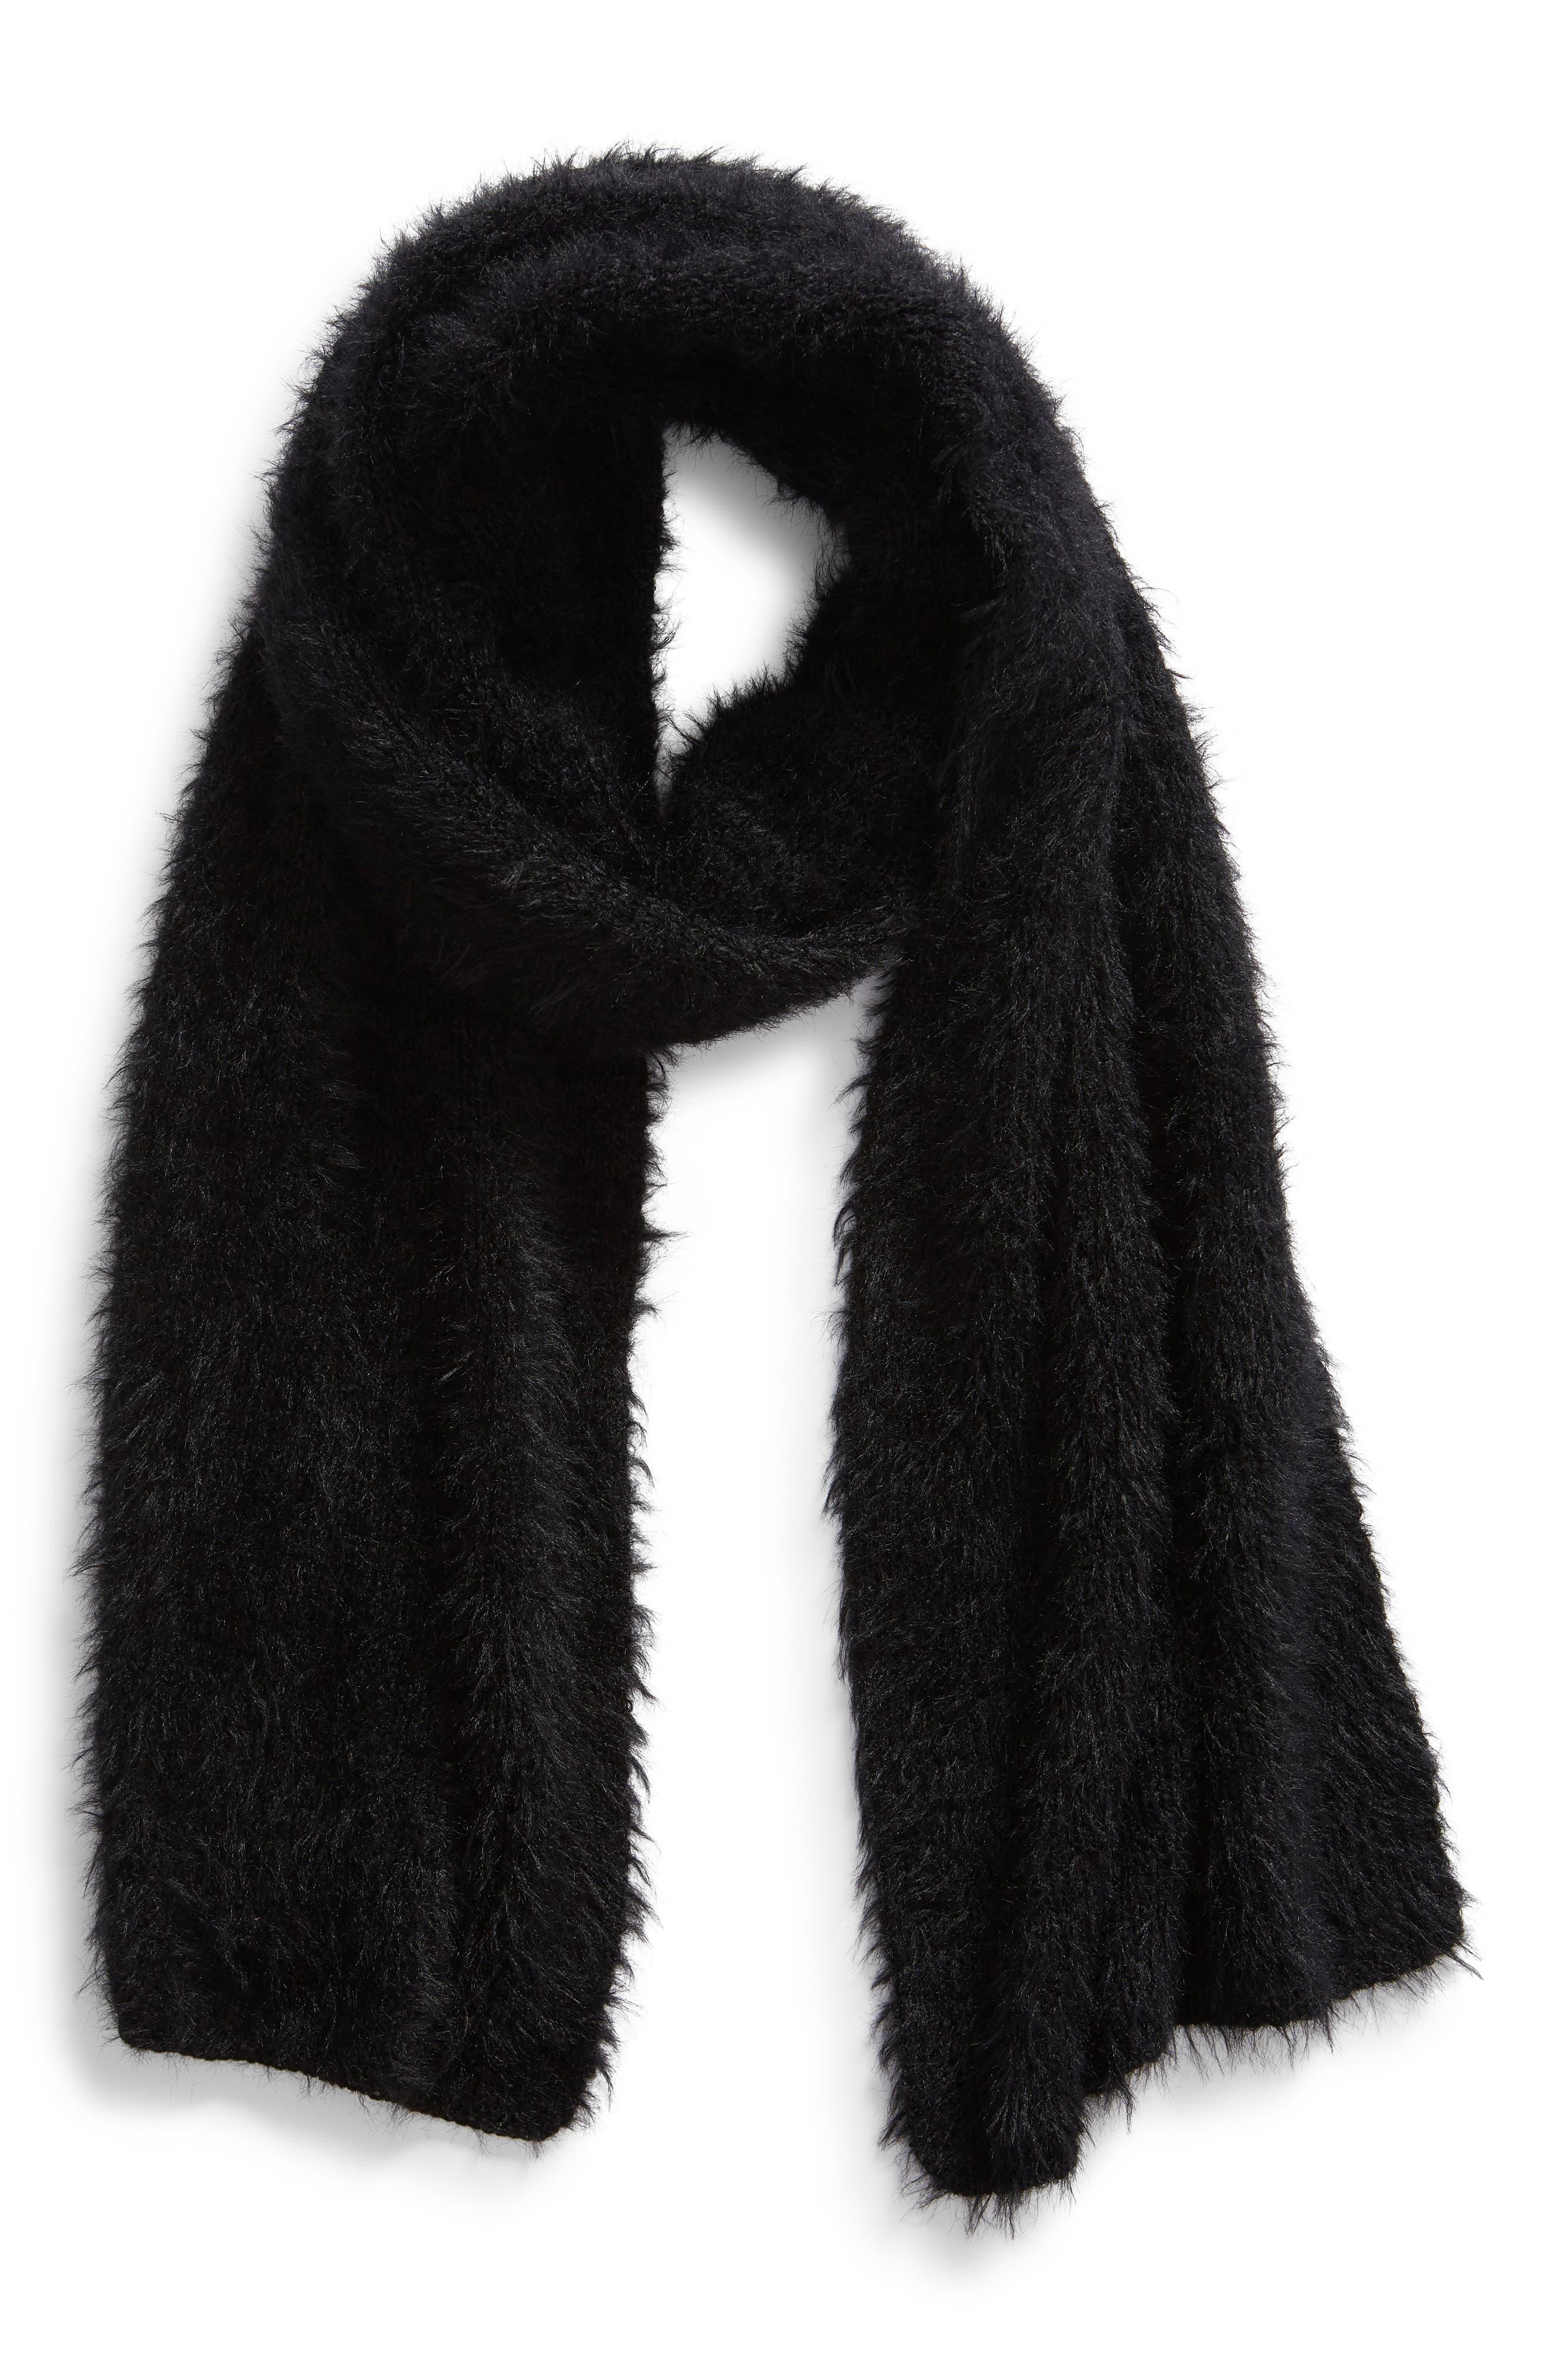 Eyleash Knit Muffler,                             Alternate thumbnail 2, color,                             001